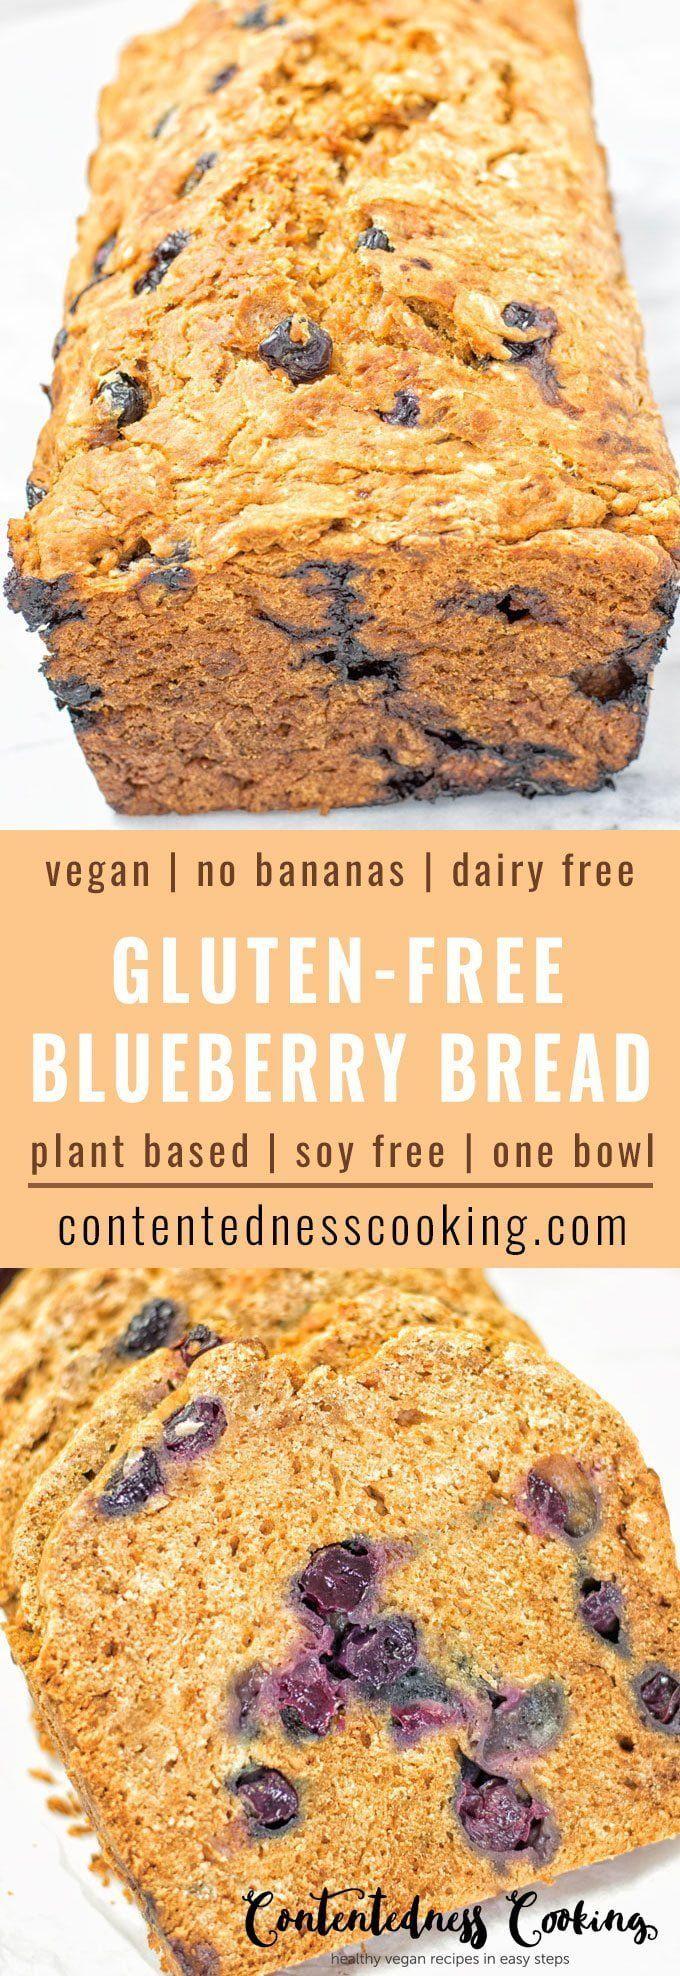 Gluten-Free Blueberry Bread |